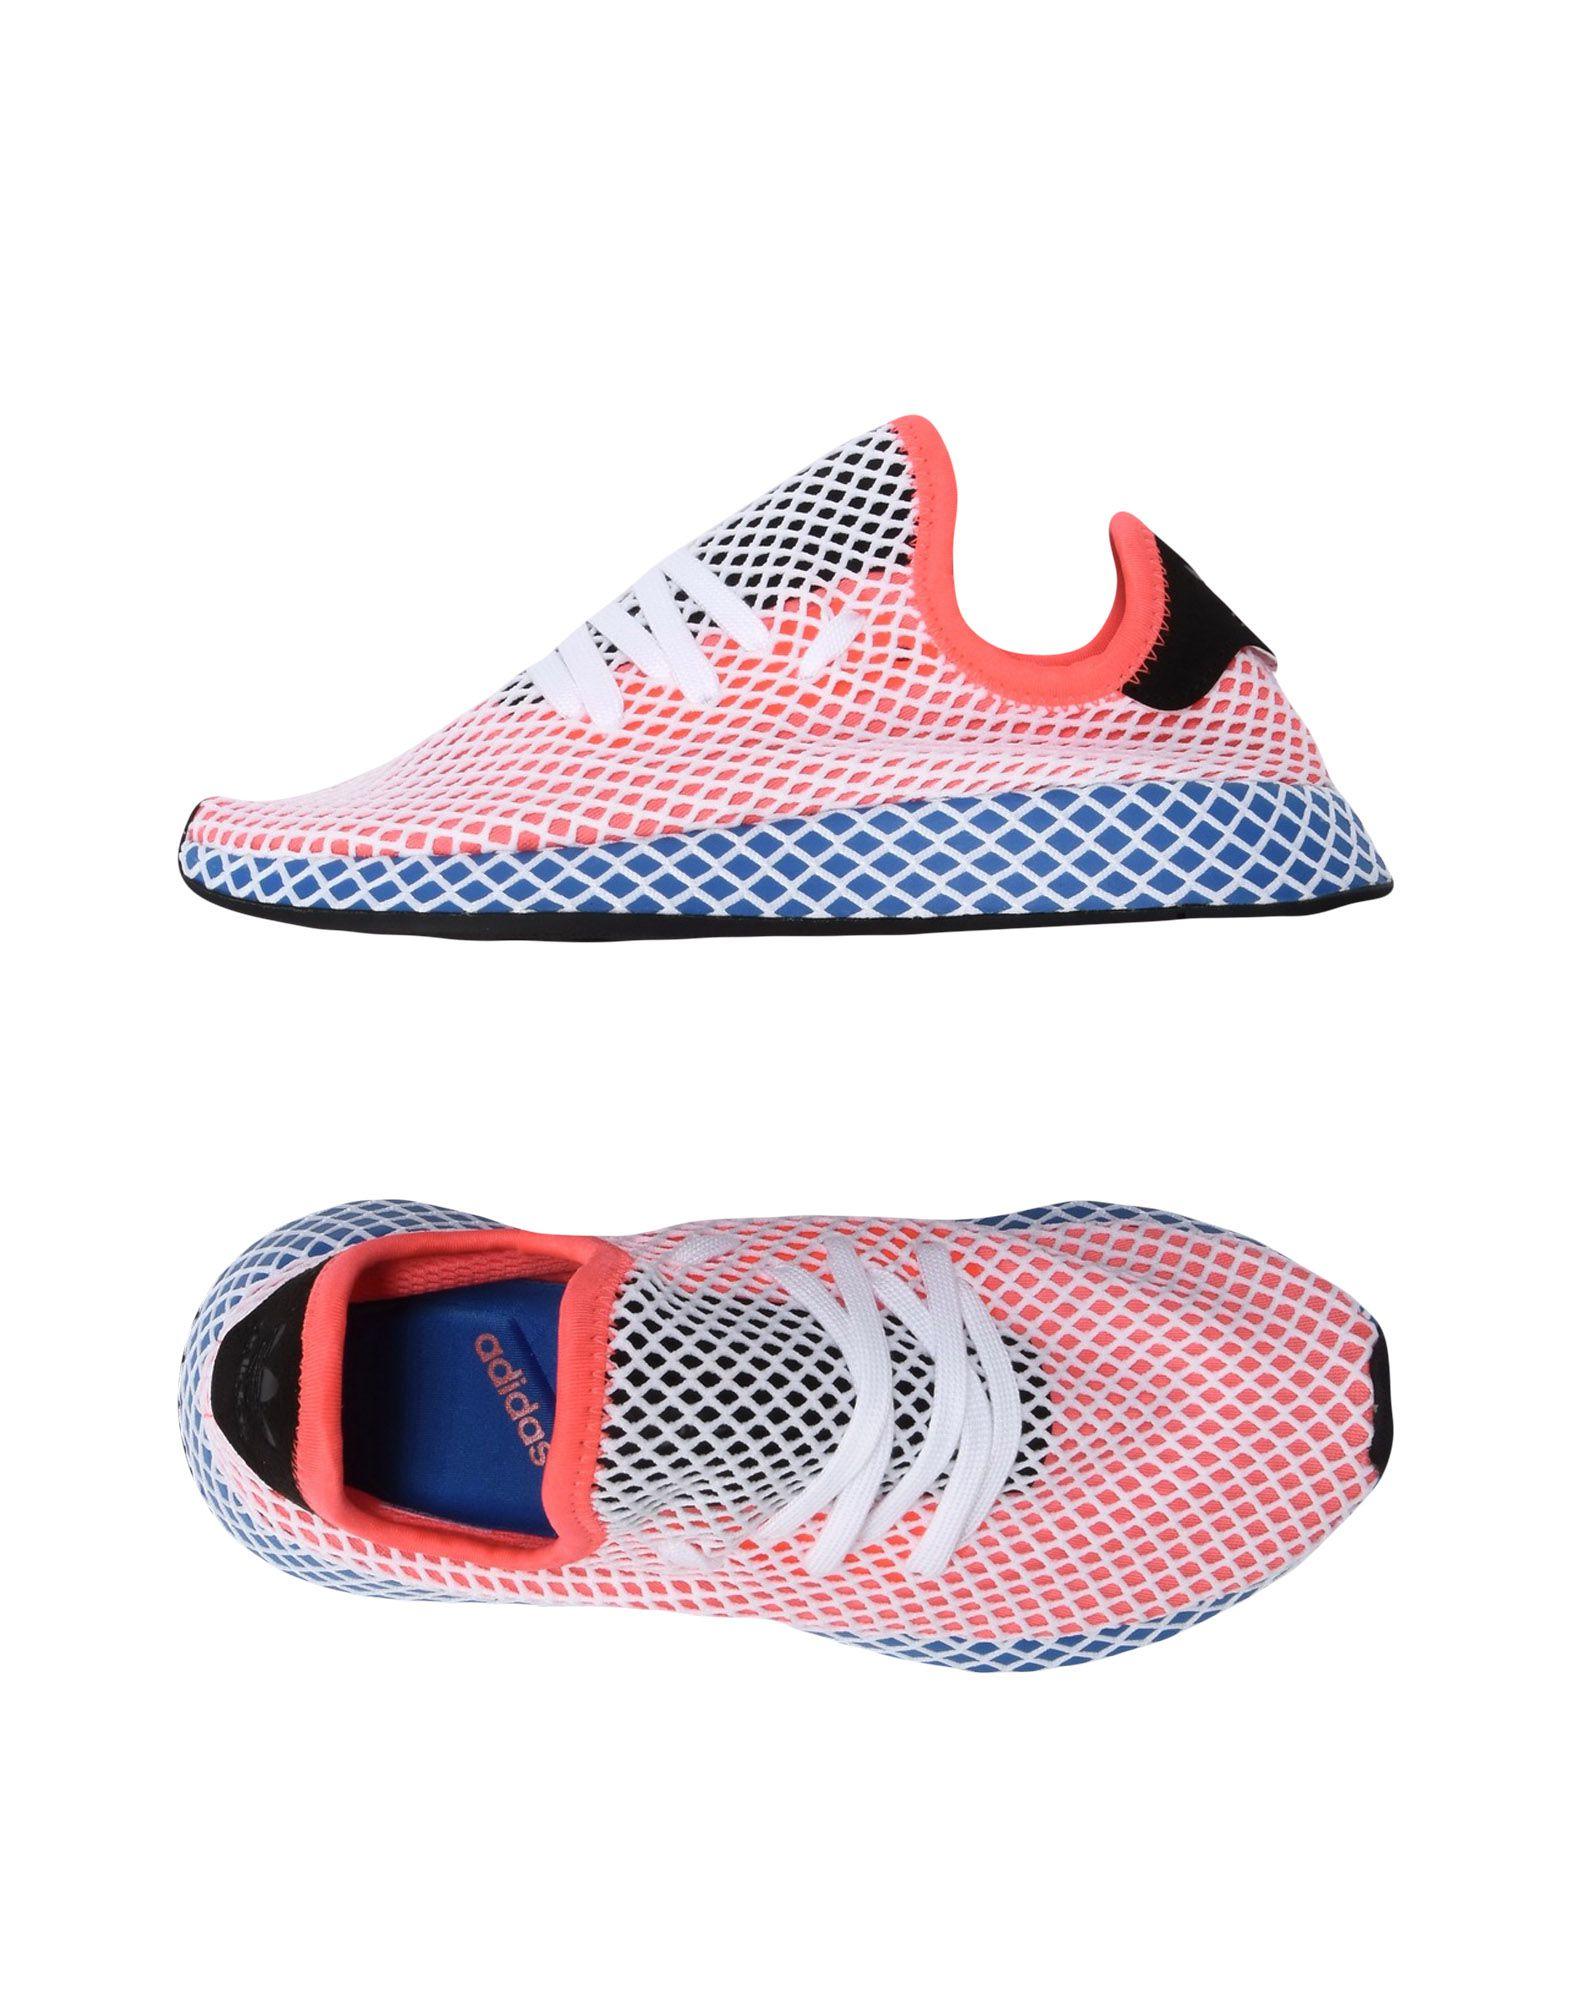 Adidas Originals Deerupt Runner - Uomo - 11459219XL